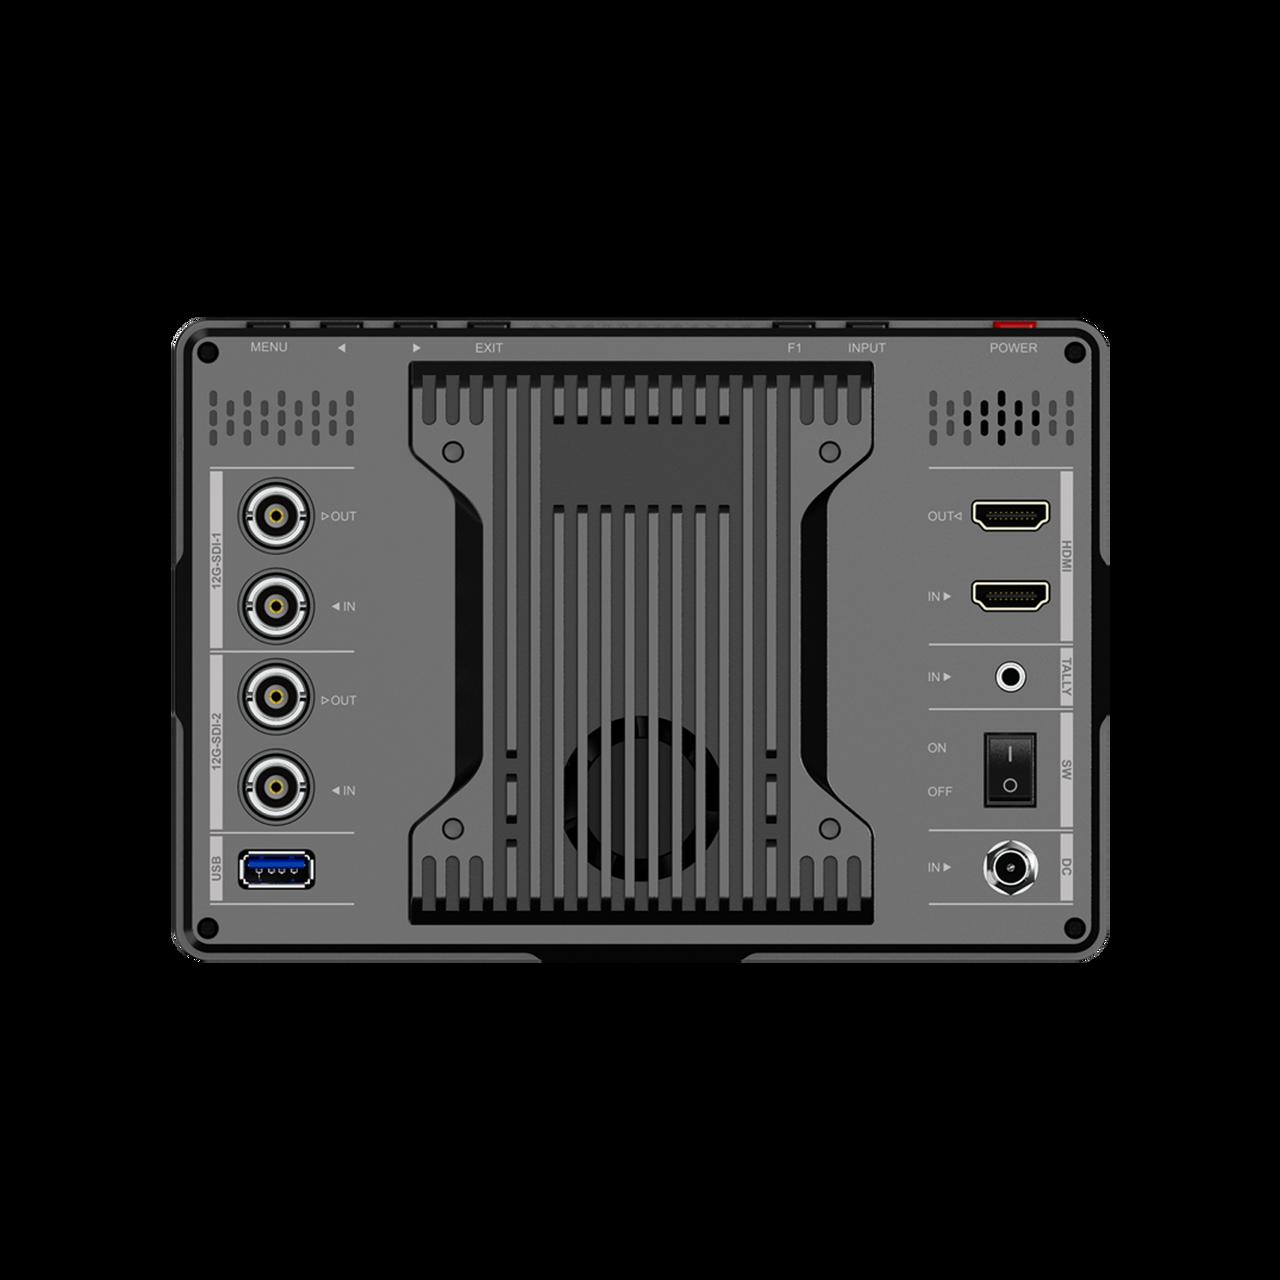 "Q7-12G  (7"" Full HD 12G SDI HDMI 2.0 2000 nits Brightness Monitor with HDR/3D LUTs)"